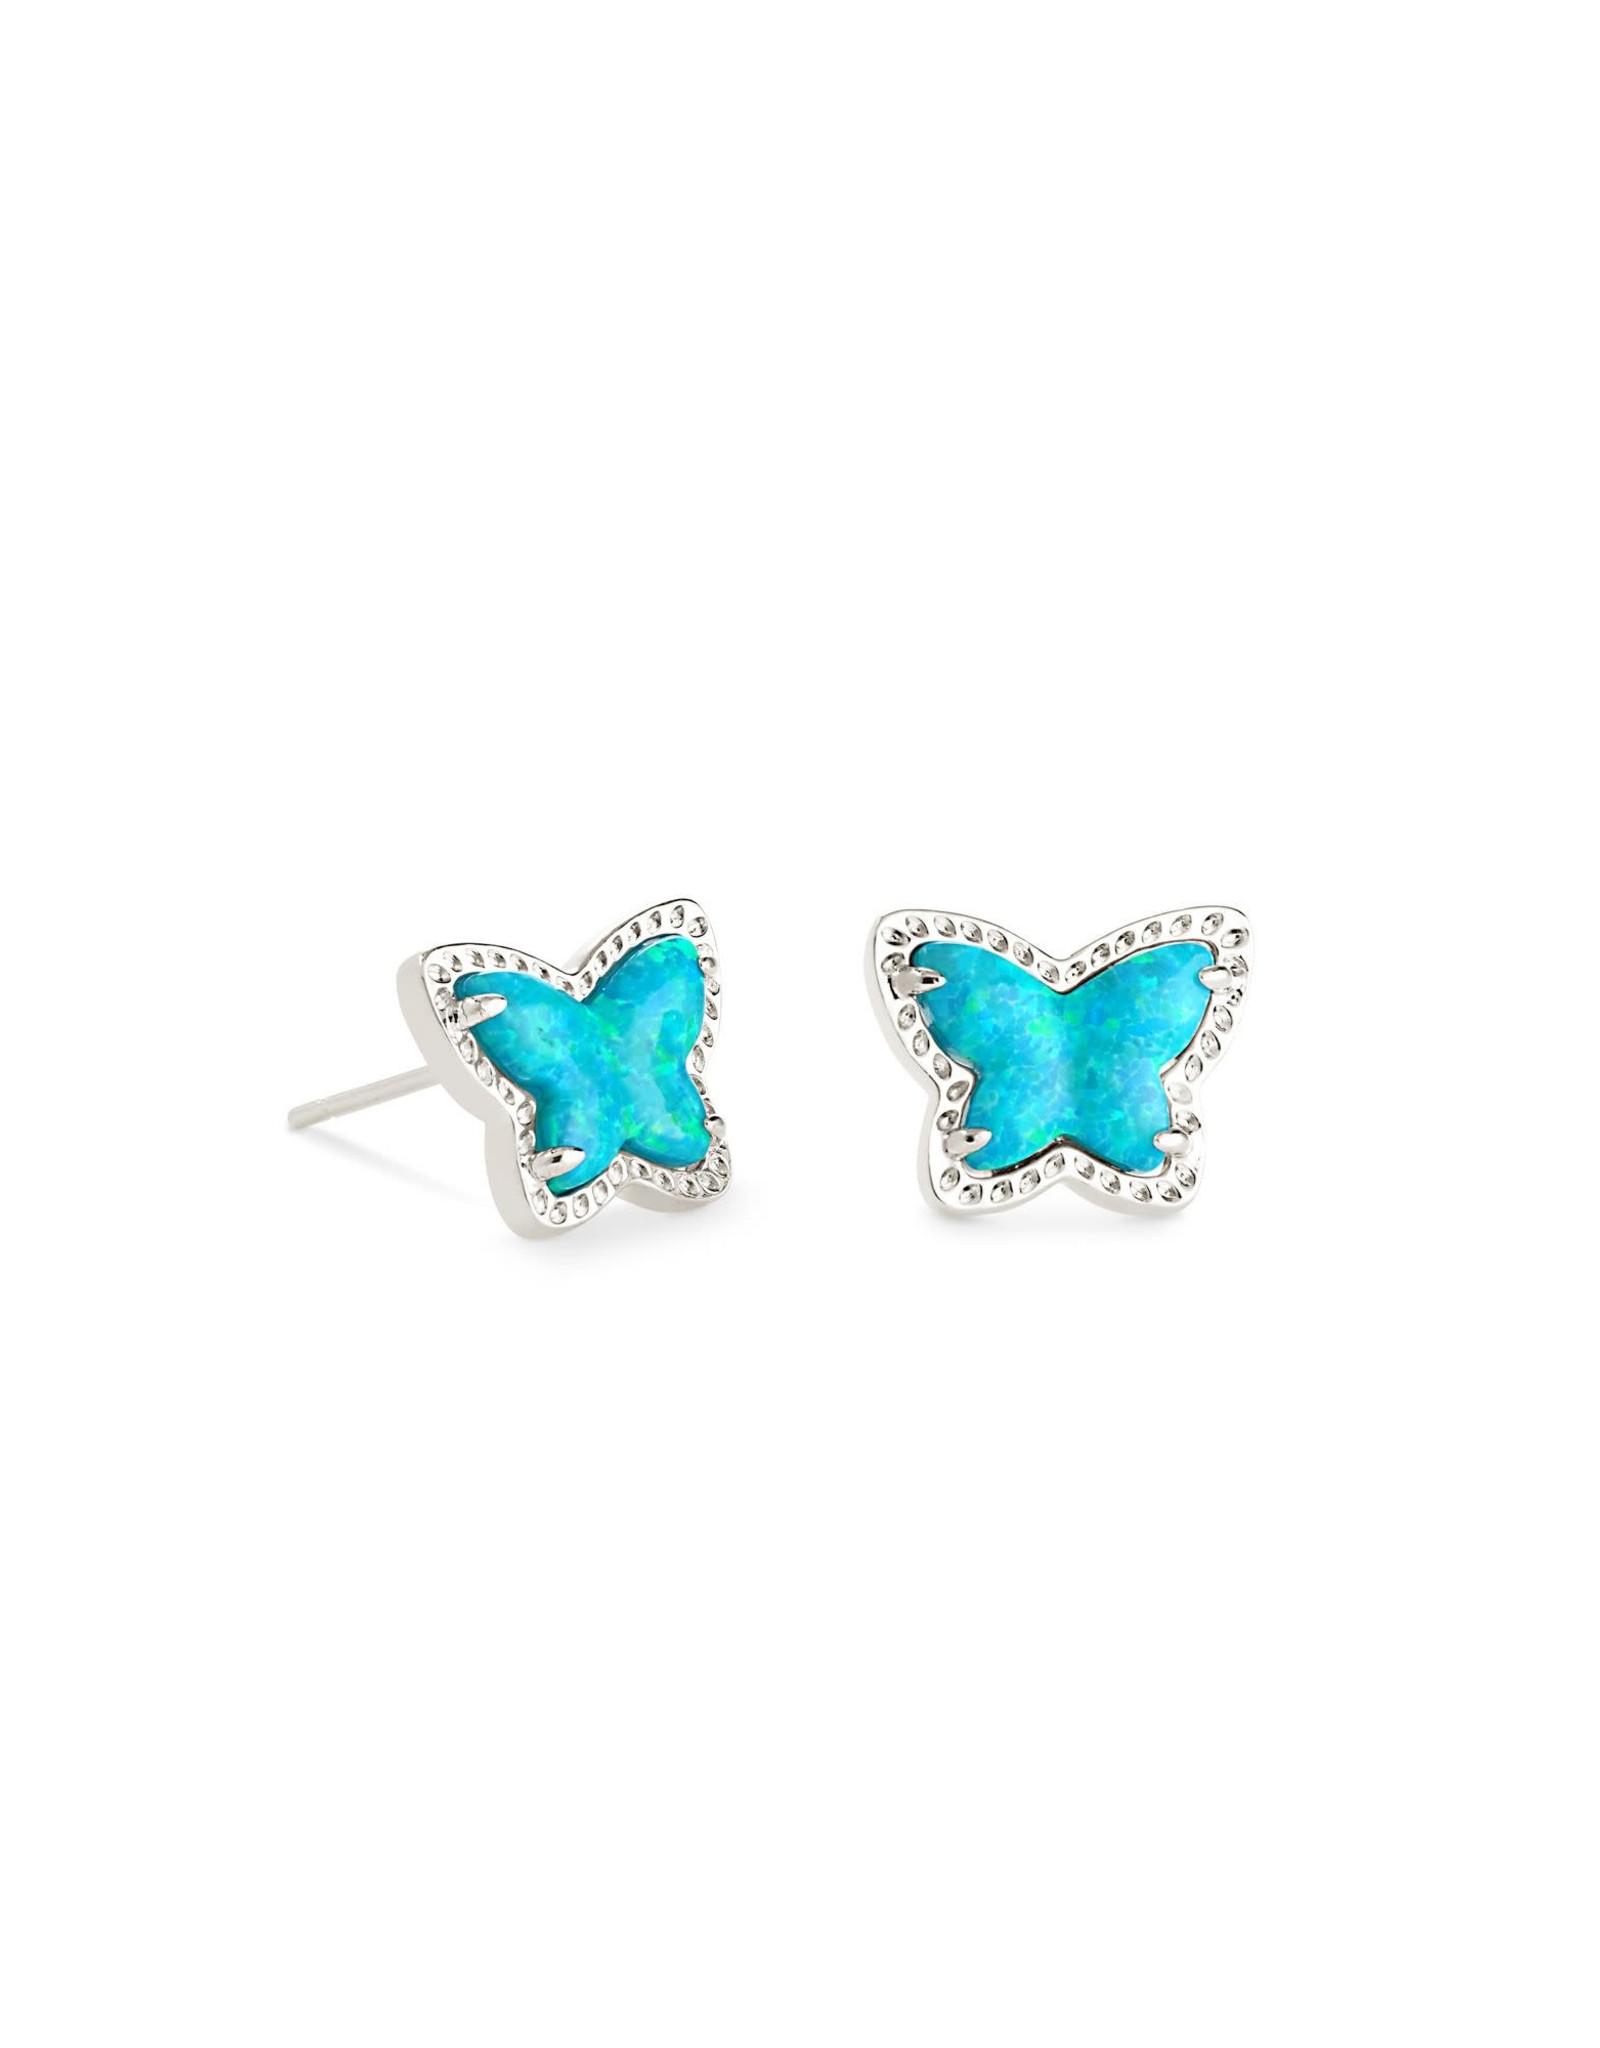 Kendra Scott Lillia Butterfly Stud Earring - Turquoise Opal/Rhodium